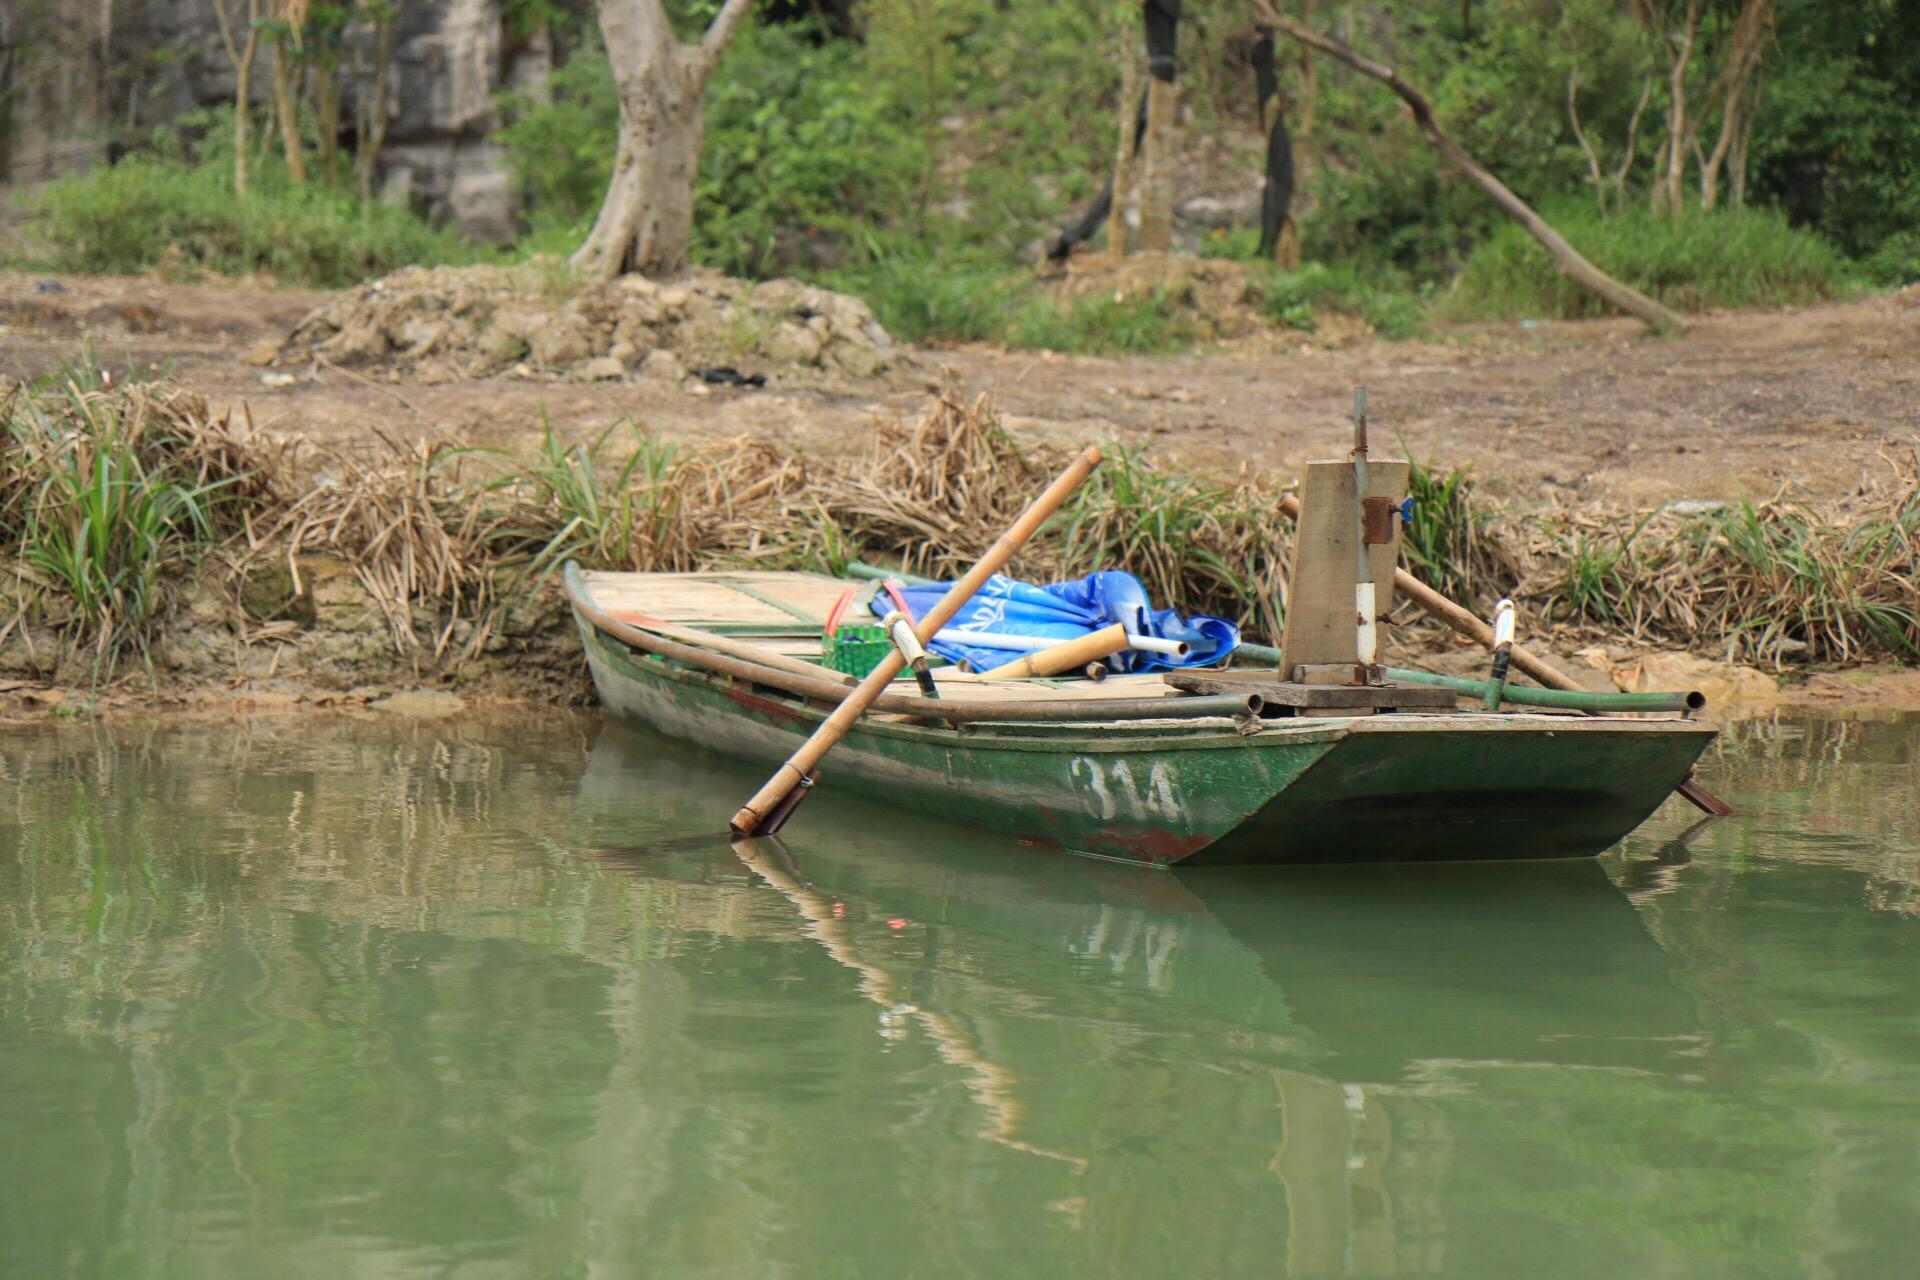 Oder es parkte mal eins am Ufer des Flusses.